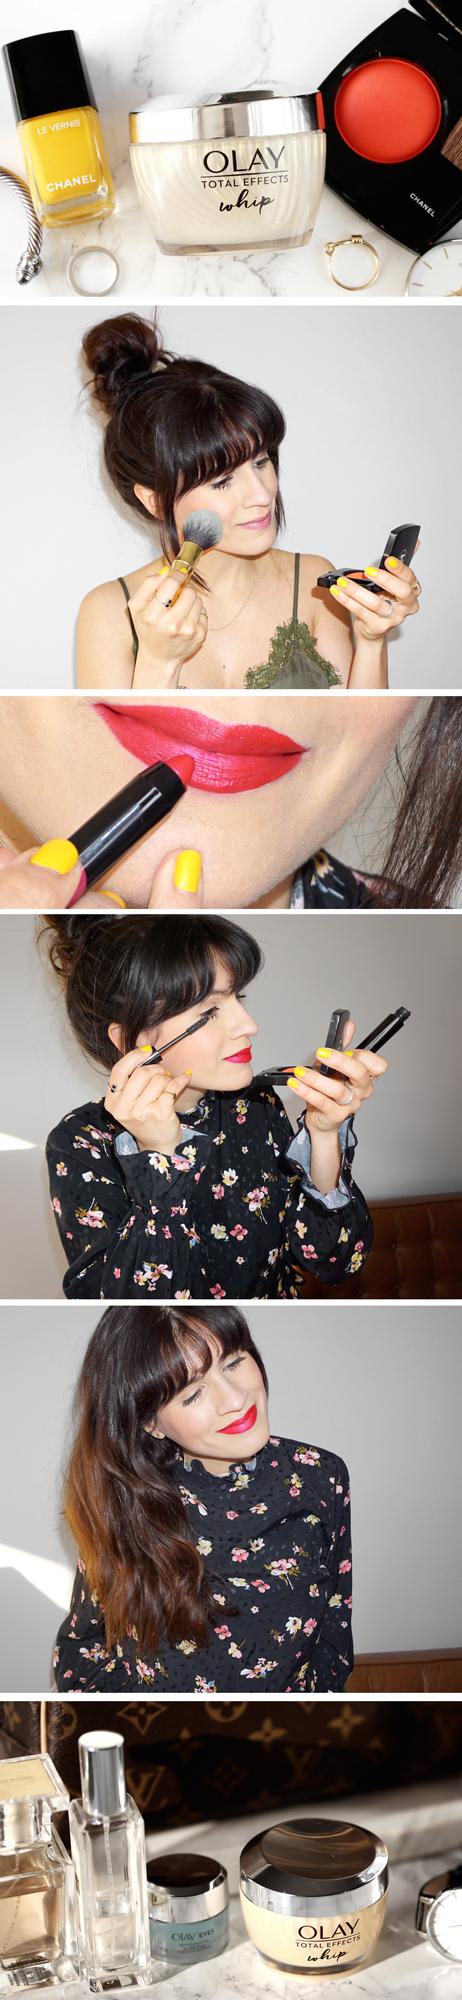 olay whips moisturizer review - woahstyle.com - beauty blog by nathalie martin.jpg